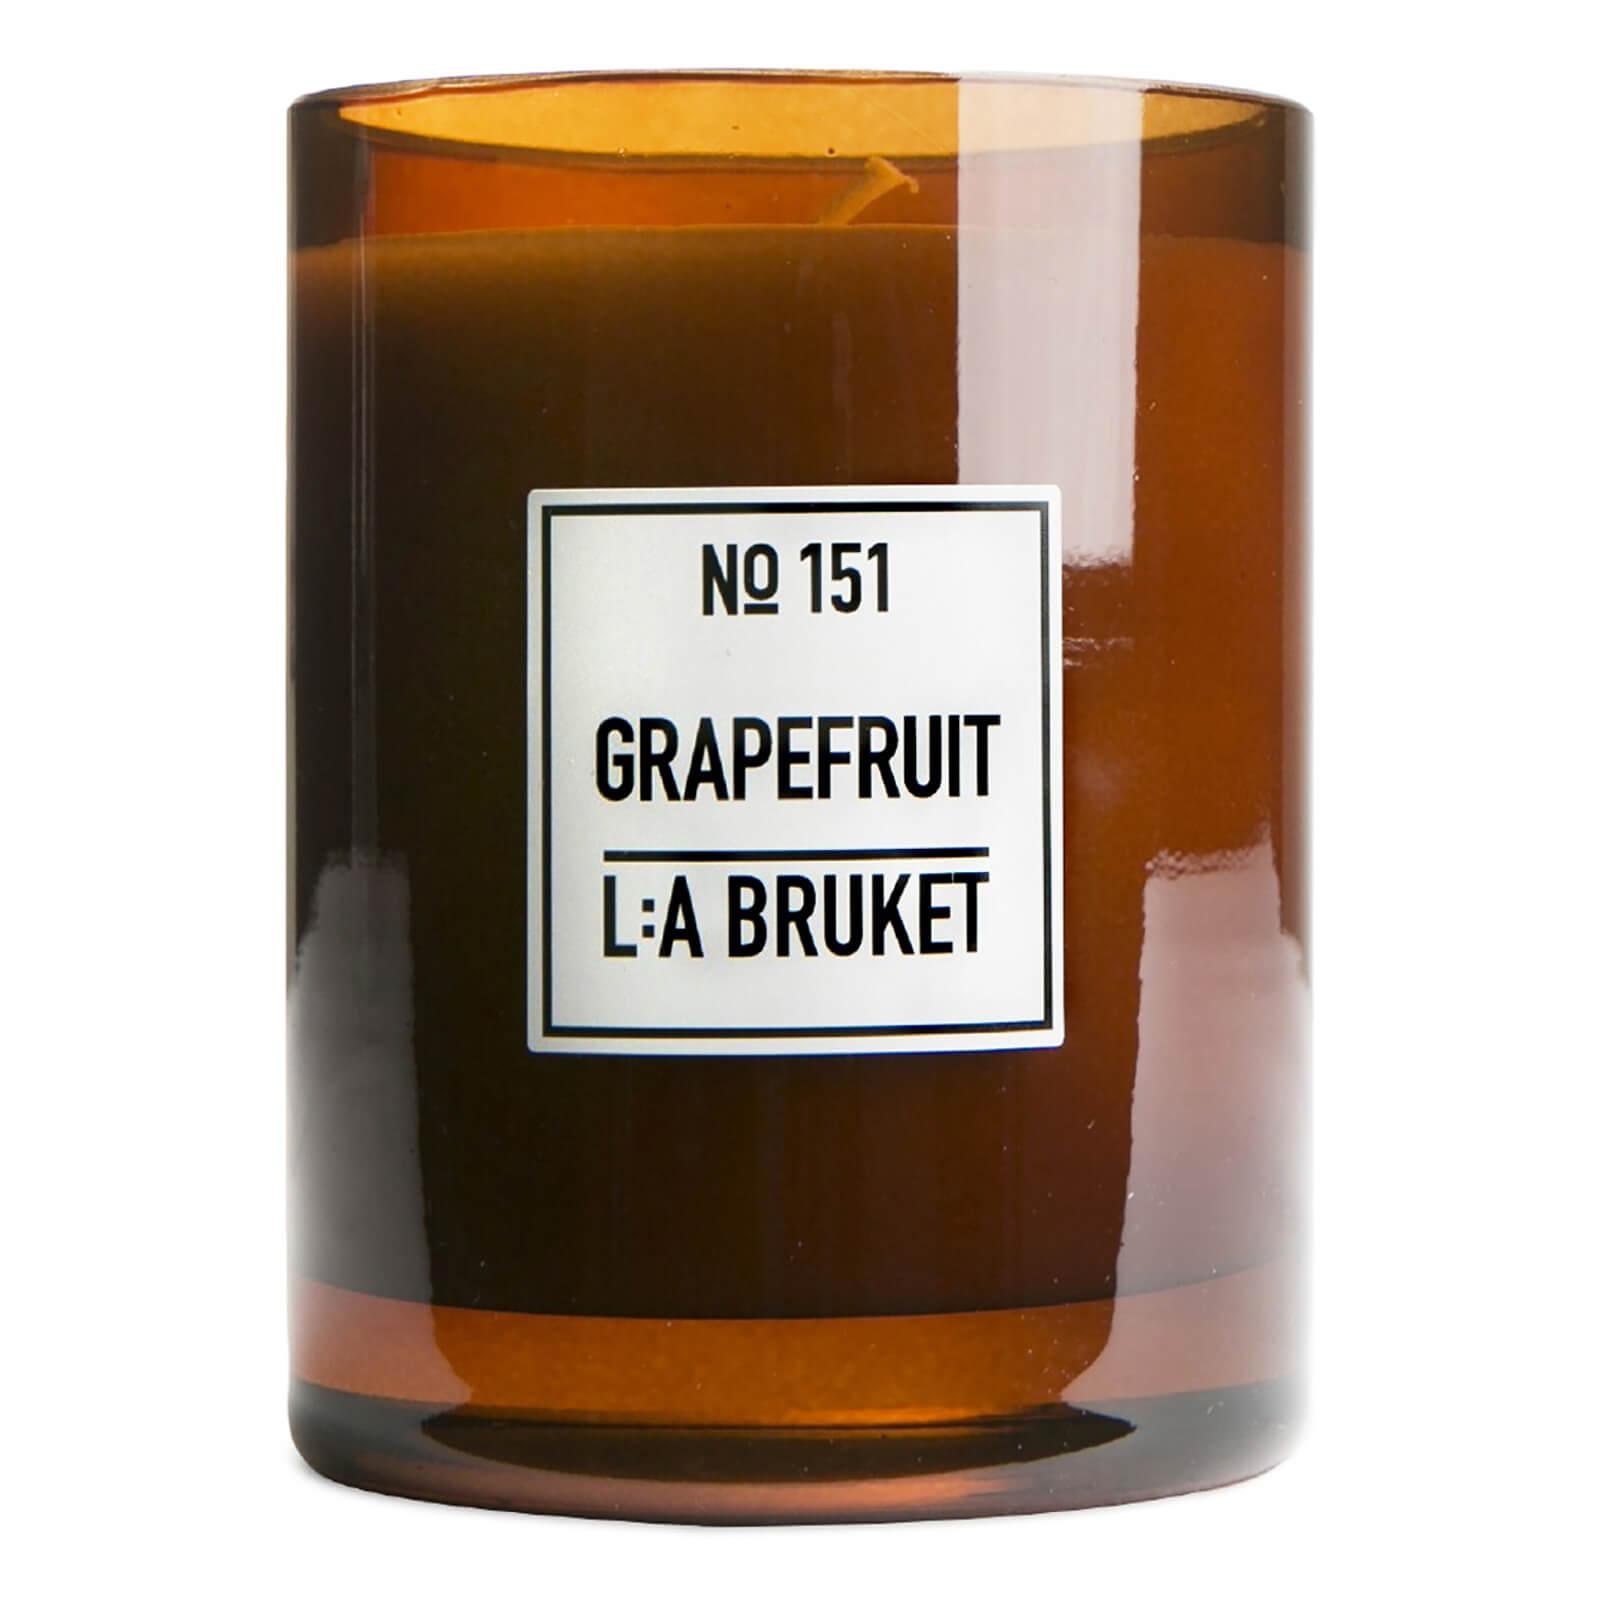 L:A BRUKET Large Grapefruit Scented Candle 260g